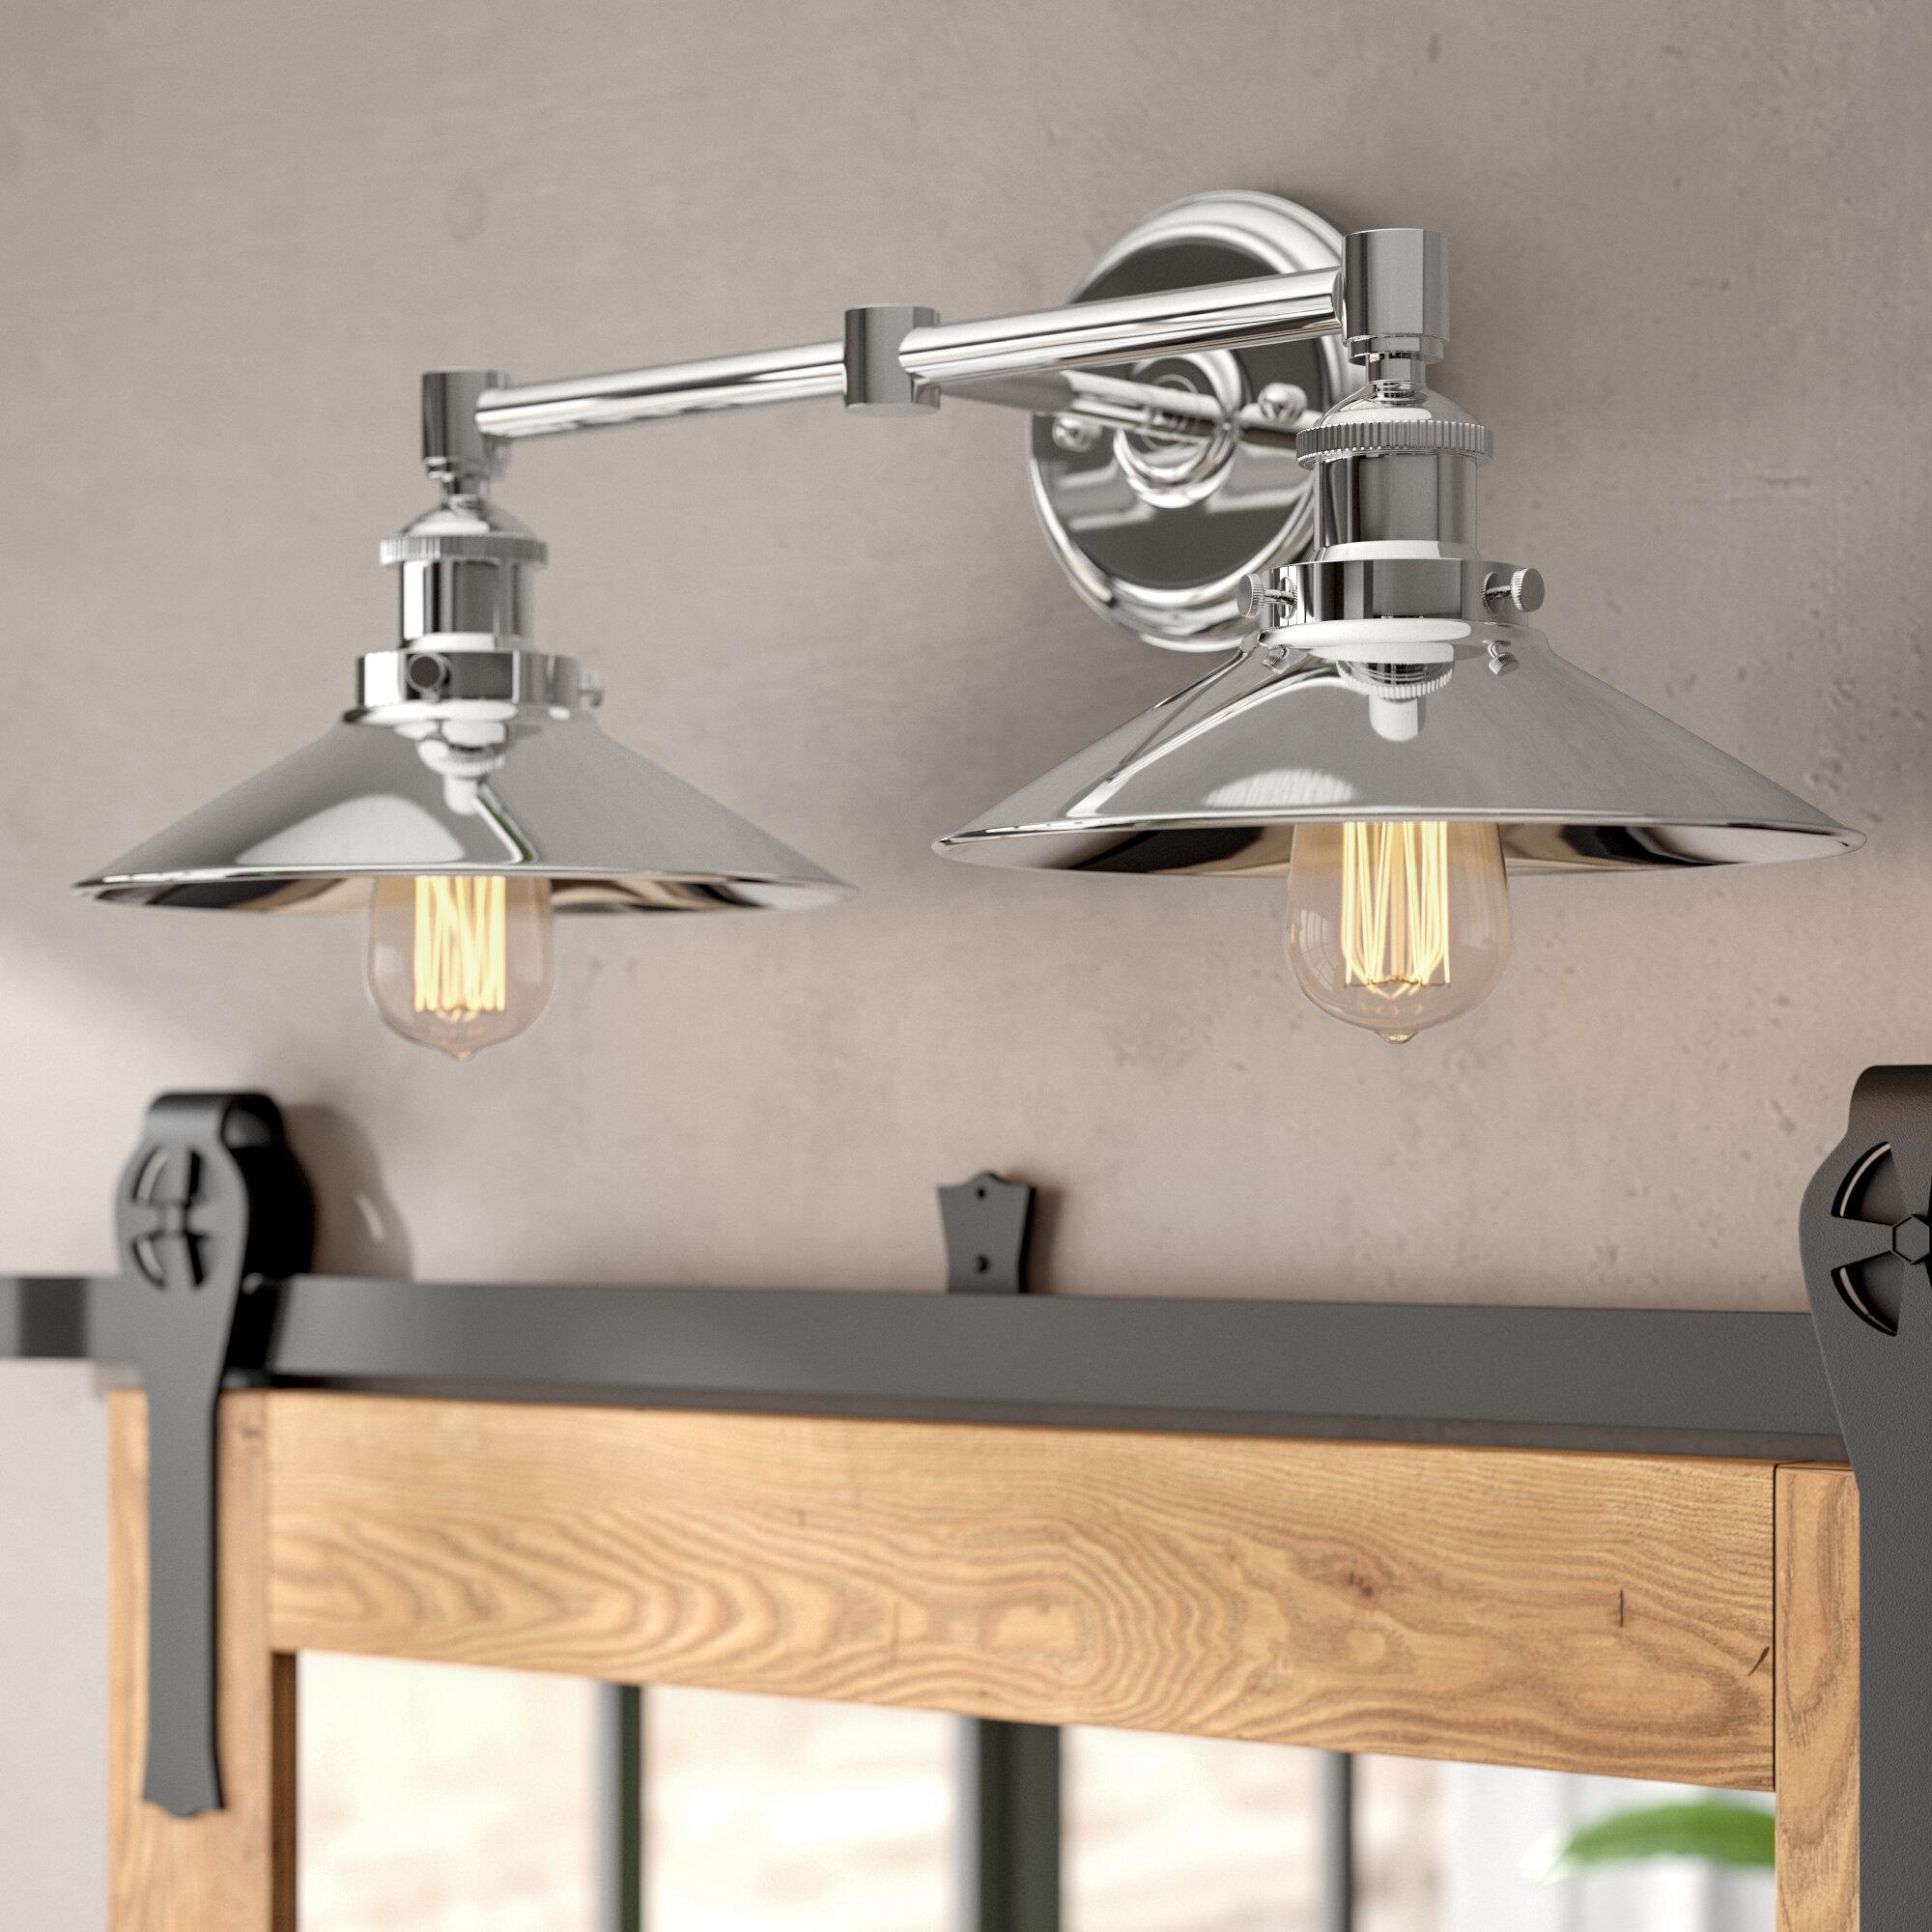 Polished Chrome Bathroom Vanity Lighting You Ll Love In 2021 Wayfair